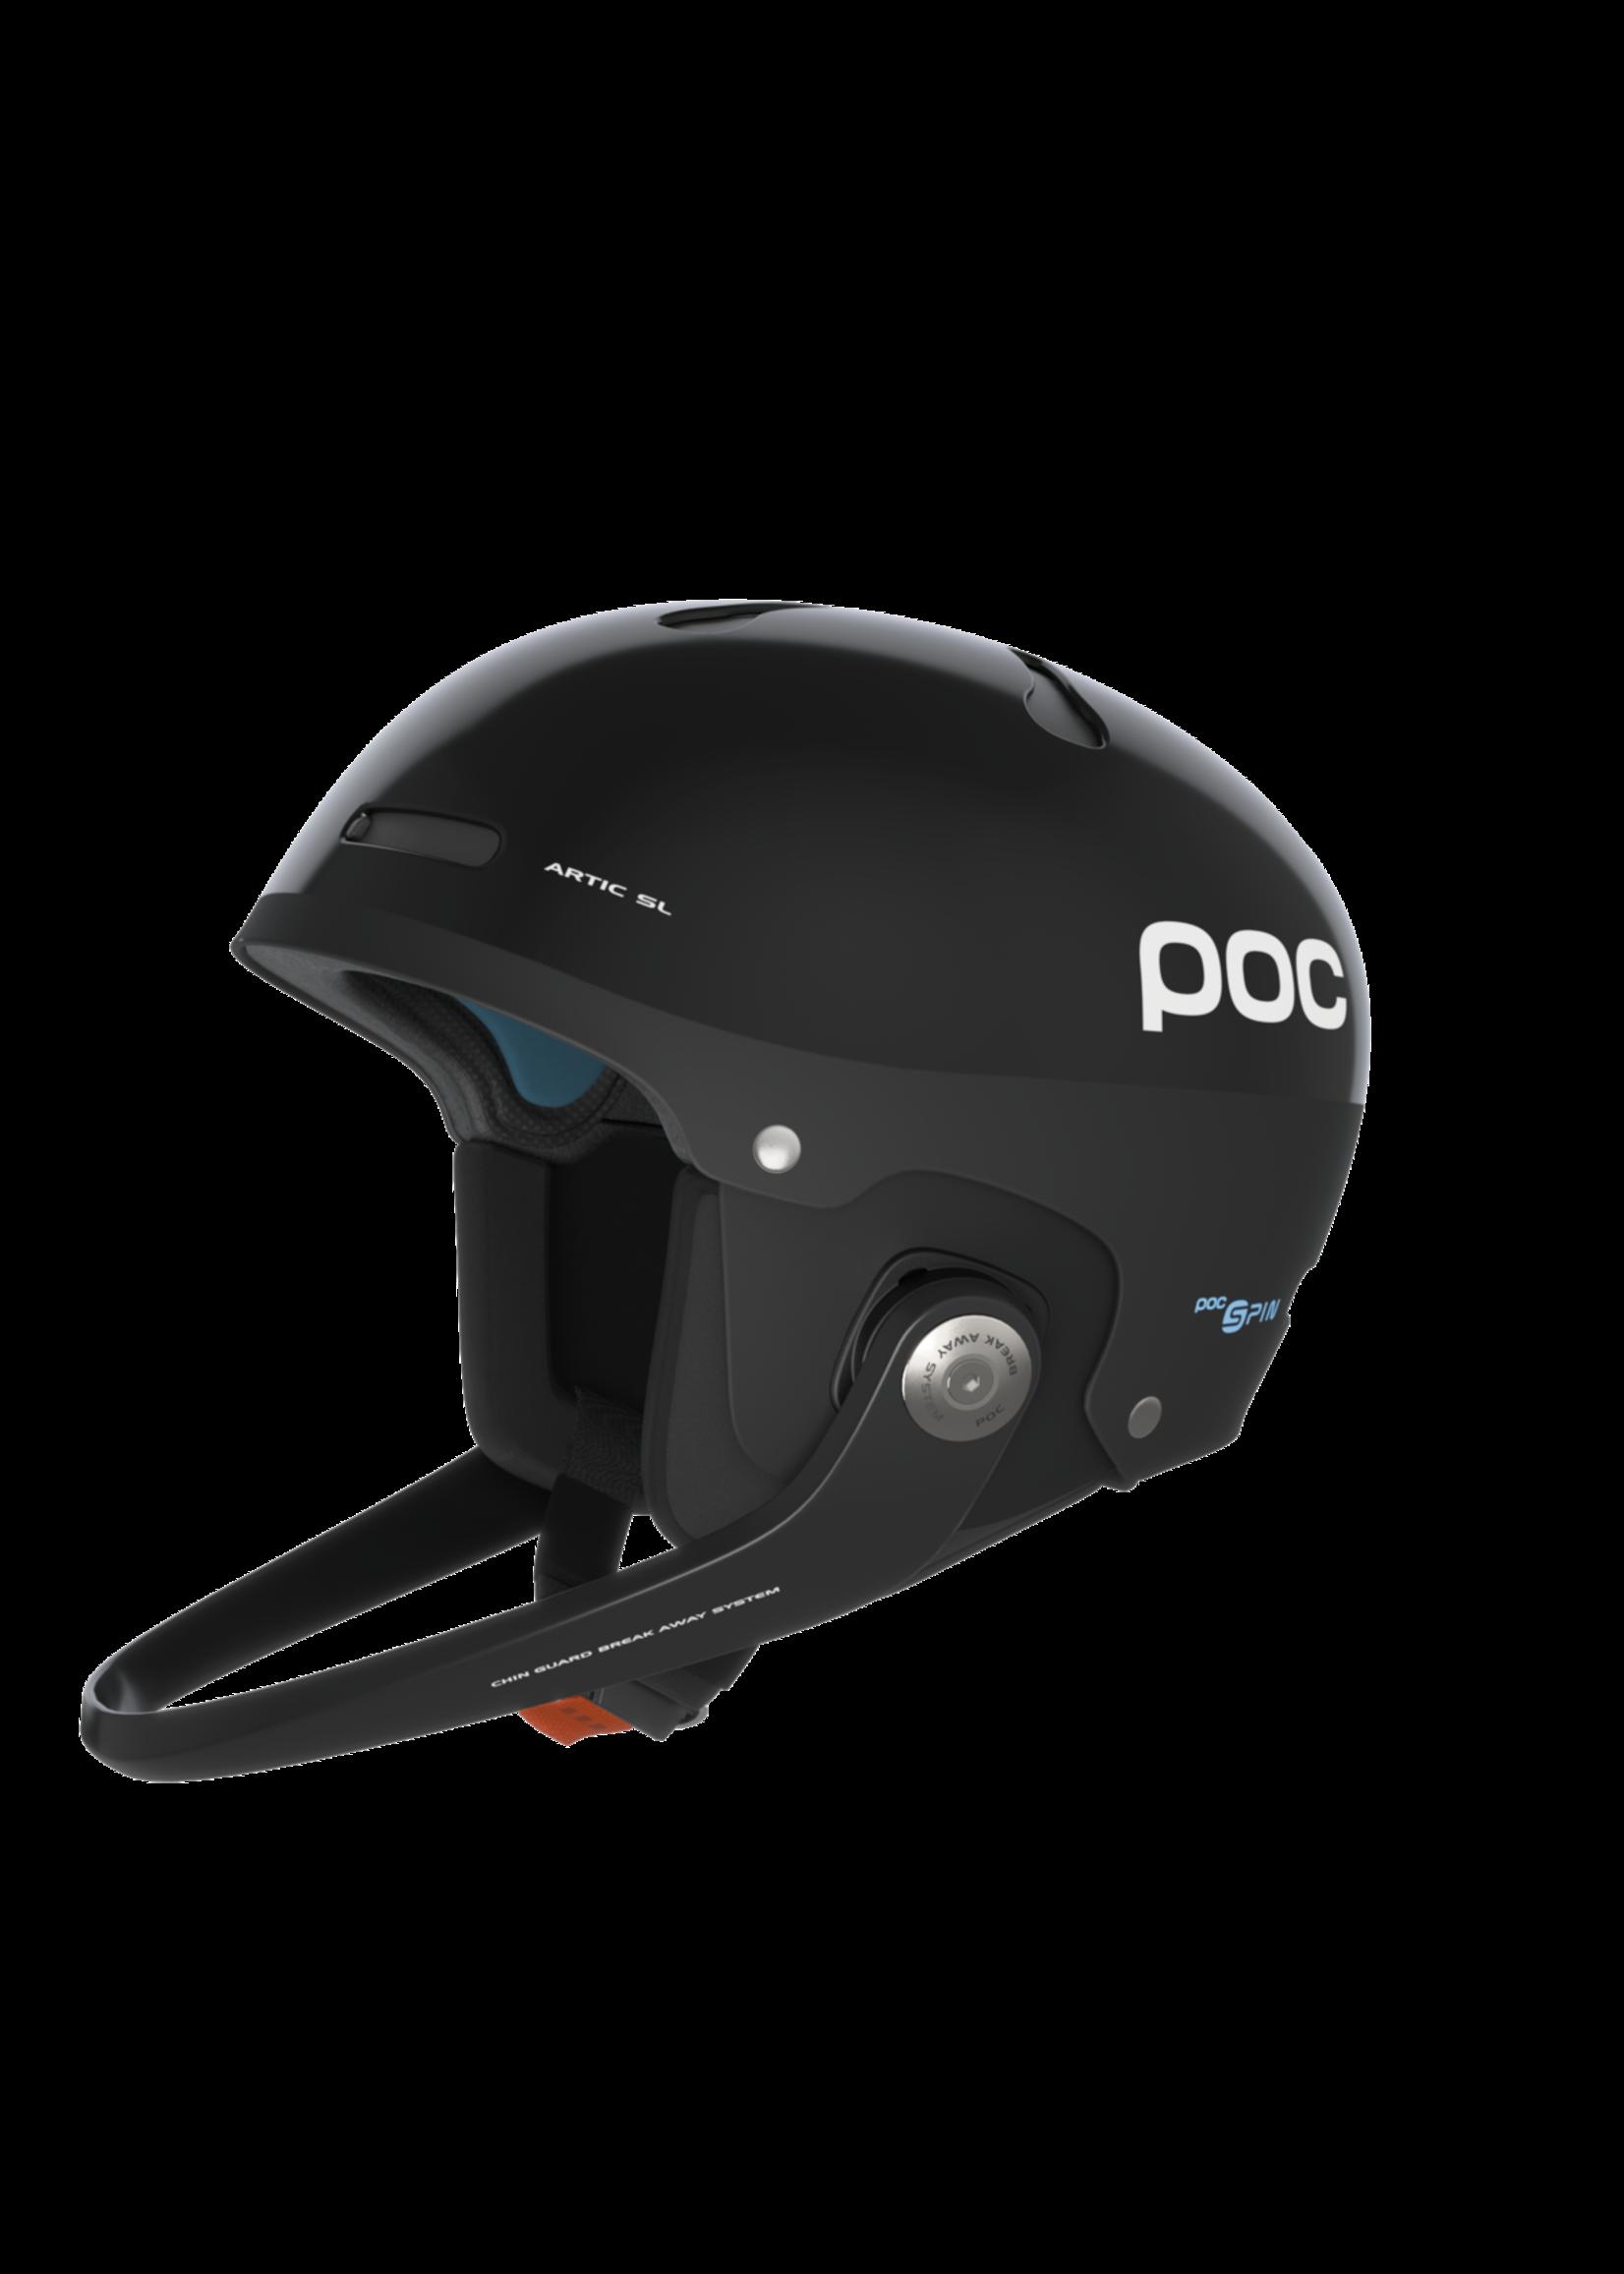 POC Race Helmet Artic SL 360 Spin